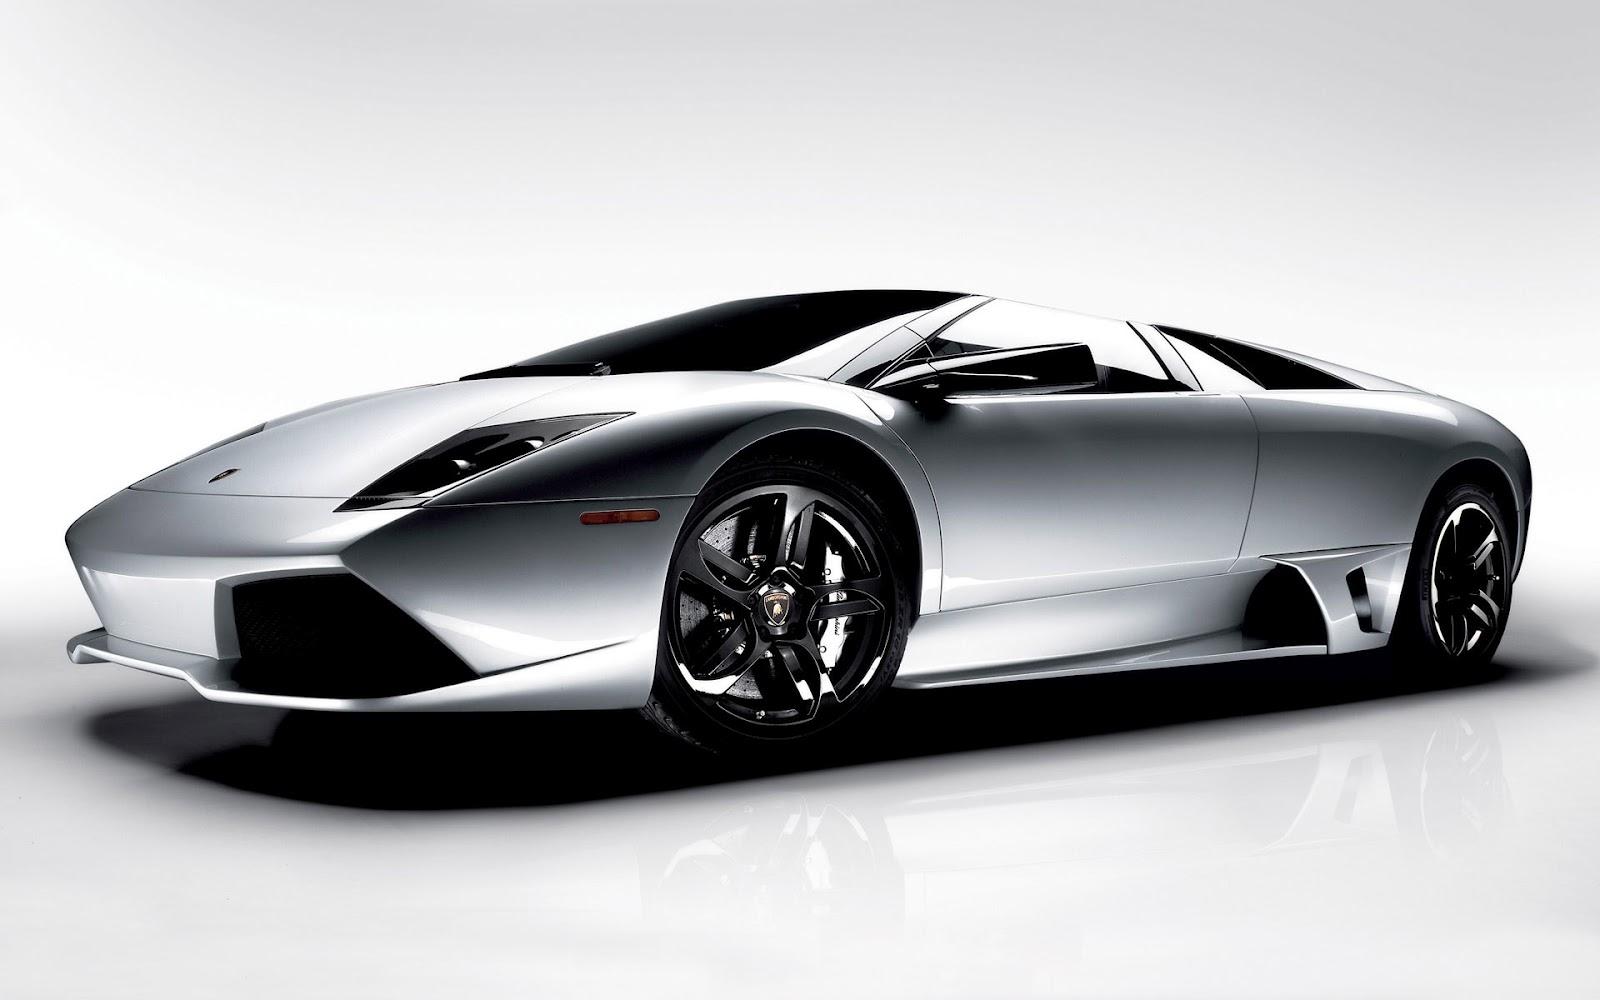 CARZ WALLPAPERS: Lamborghini Reventón Wallpapers